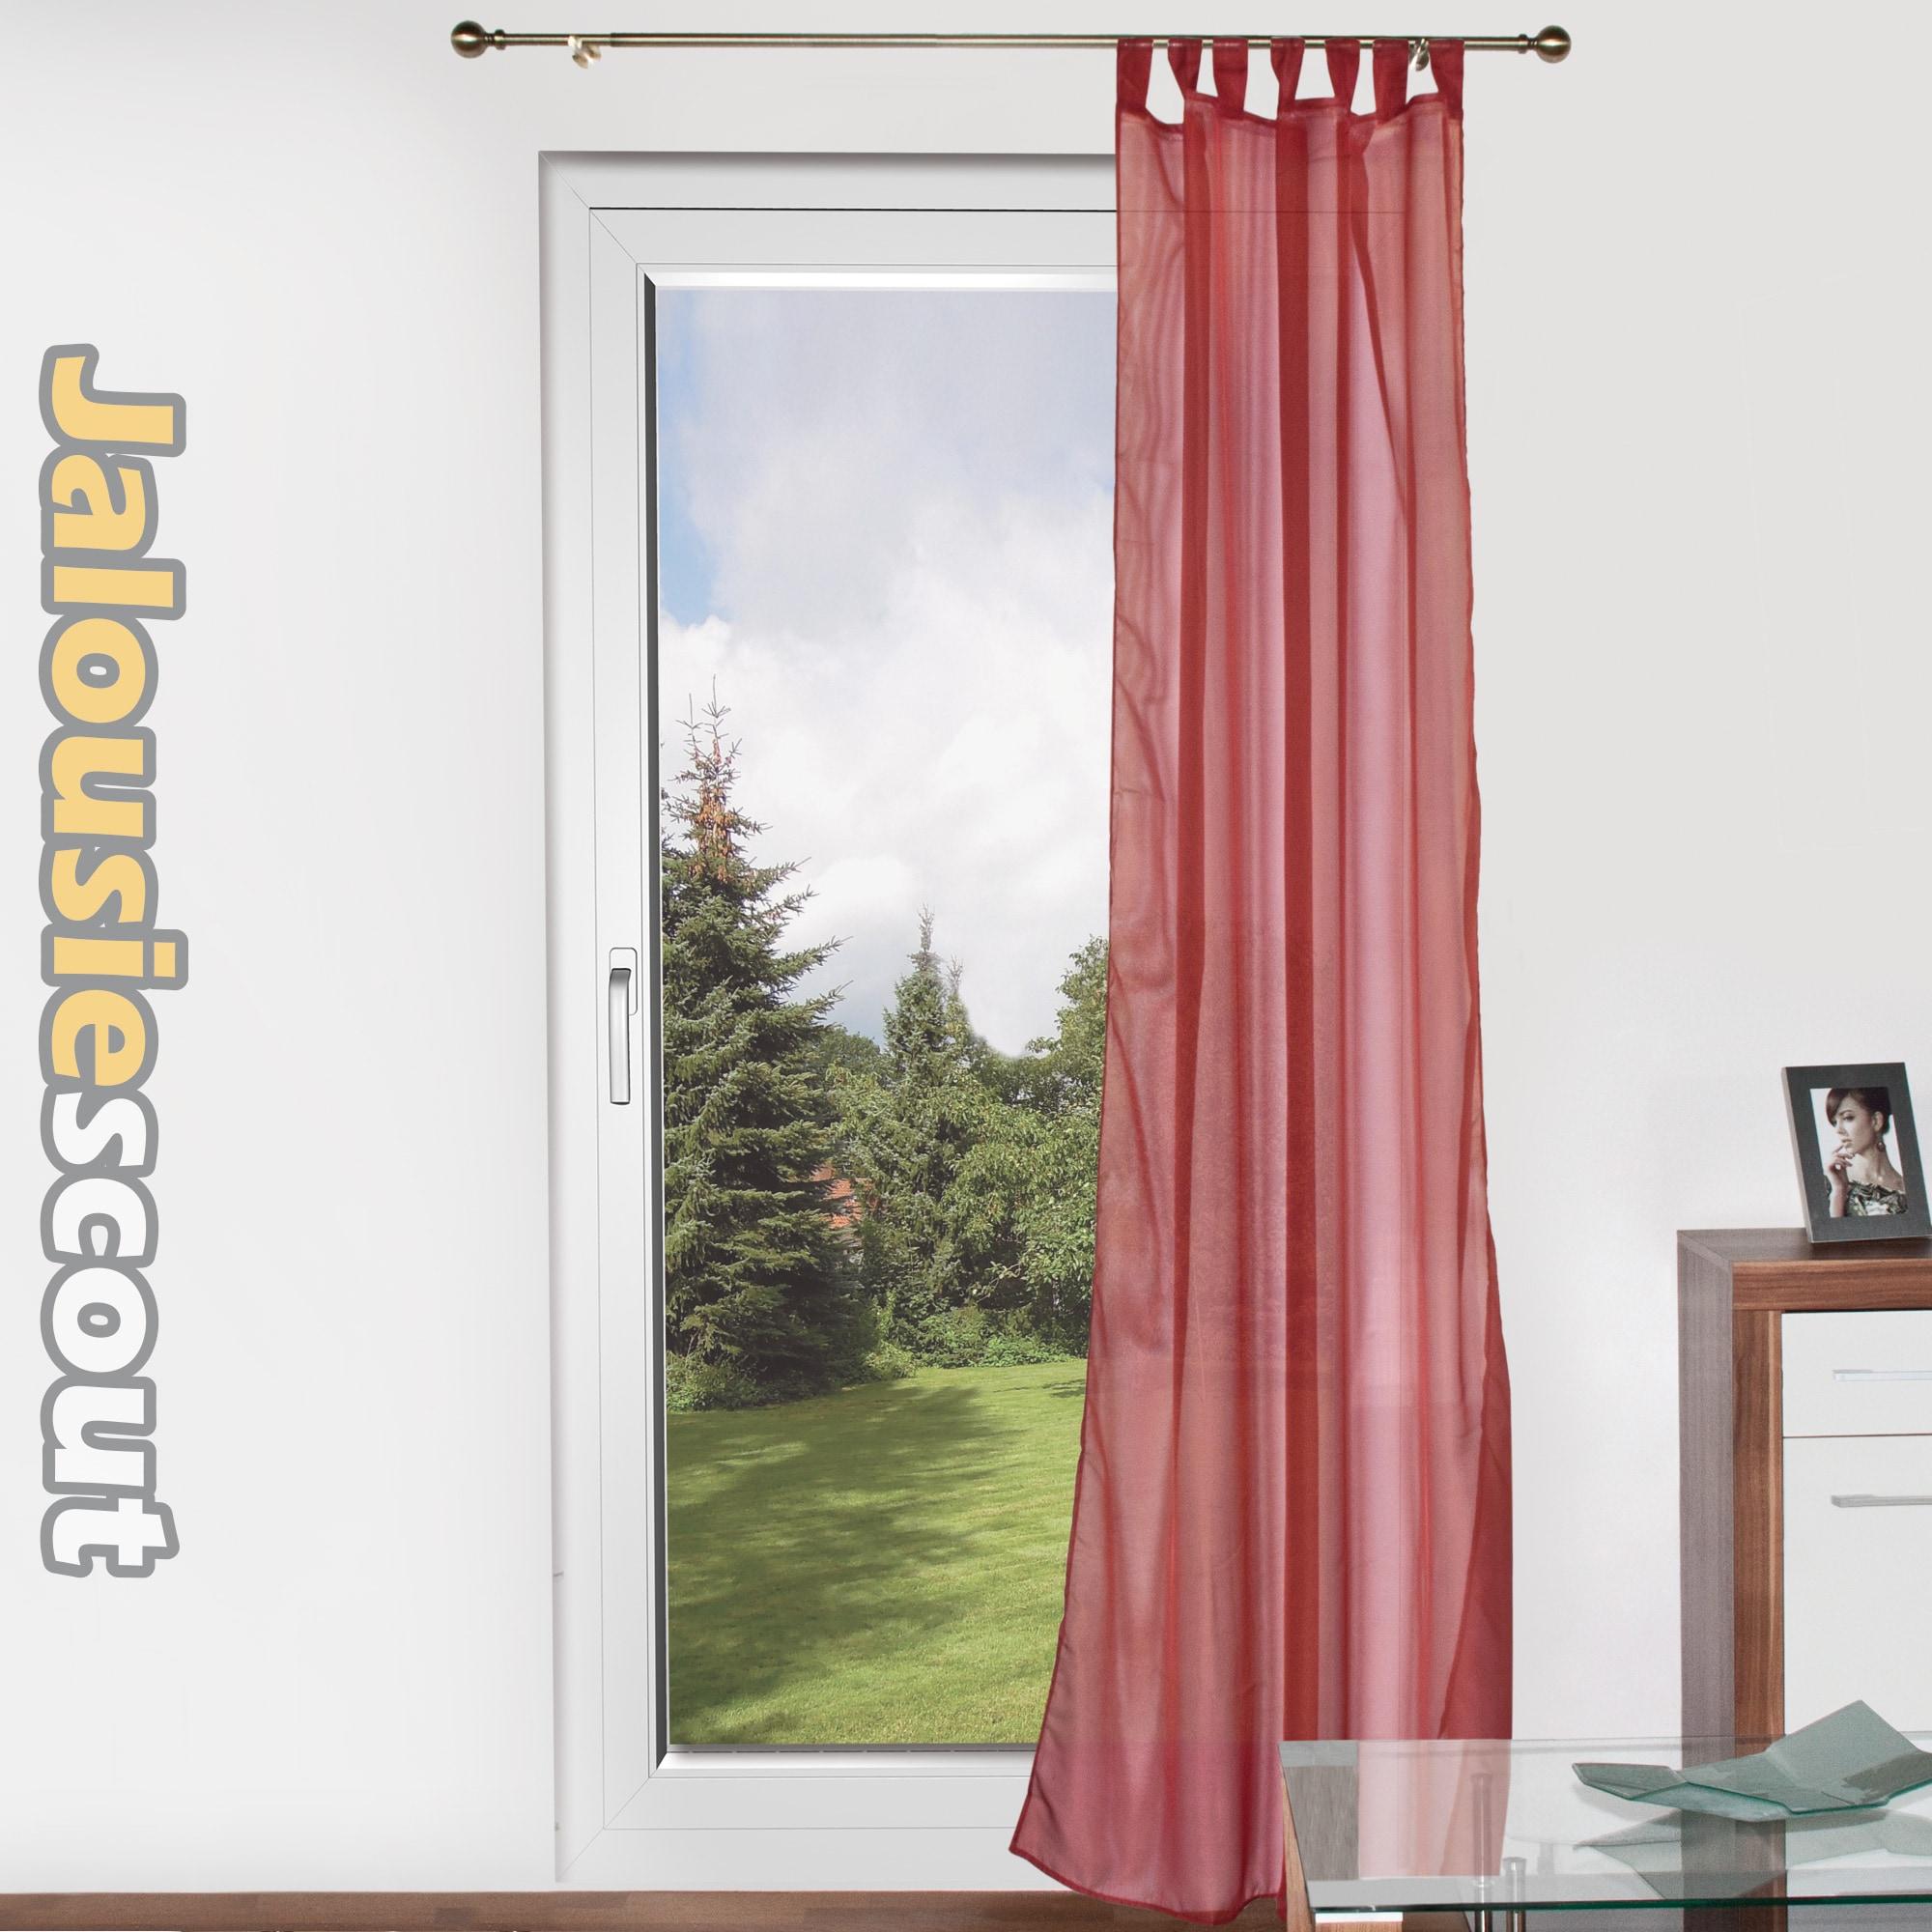 Fenster schlaufenschal vorhang taft vorhang gardine dekoschal transparent voile - Vorhang fenster ...